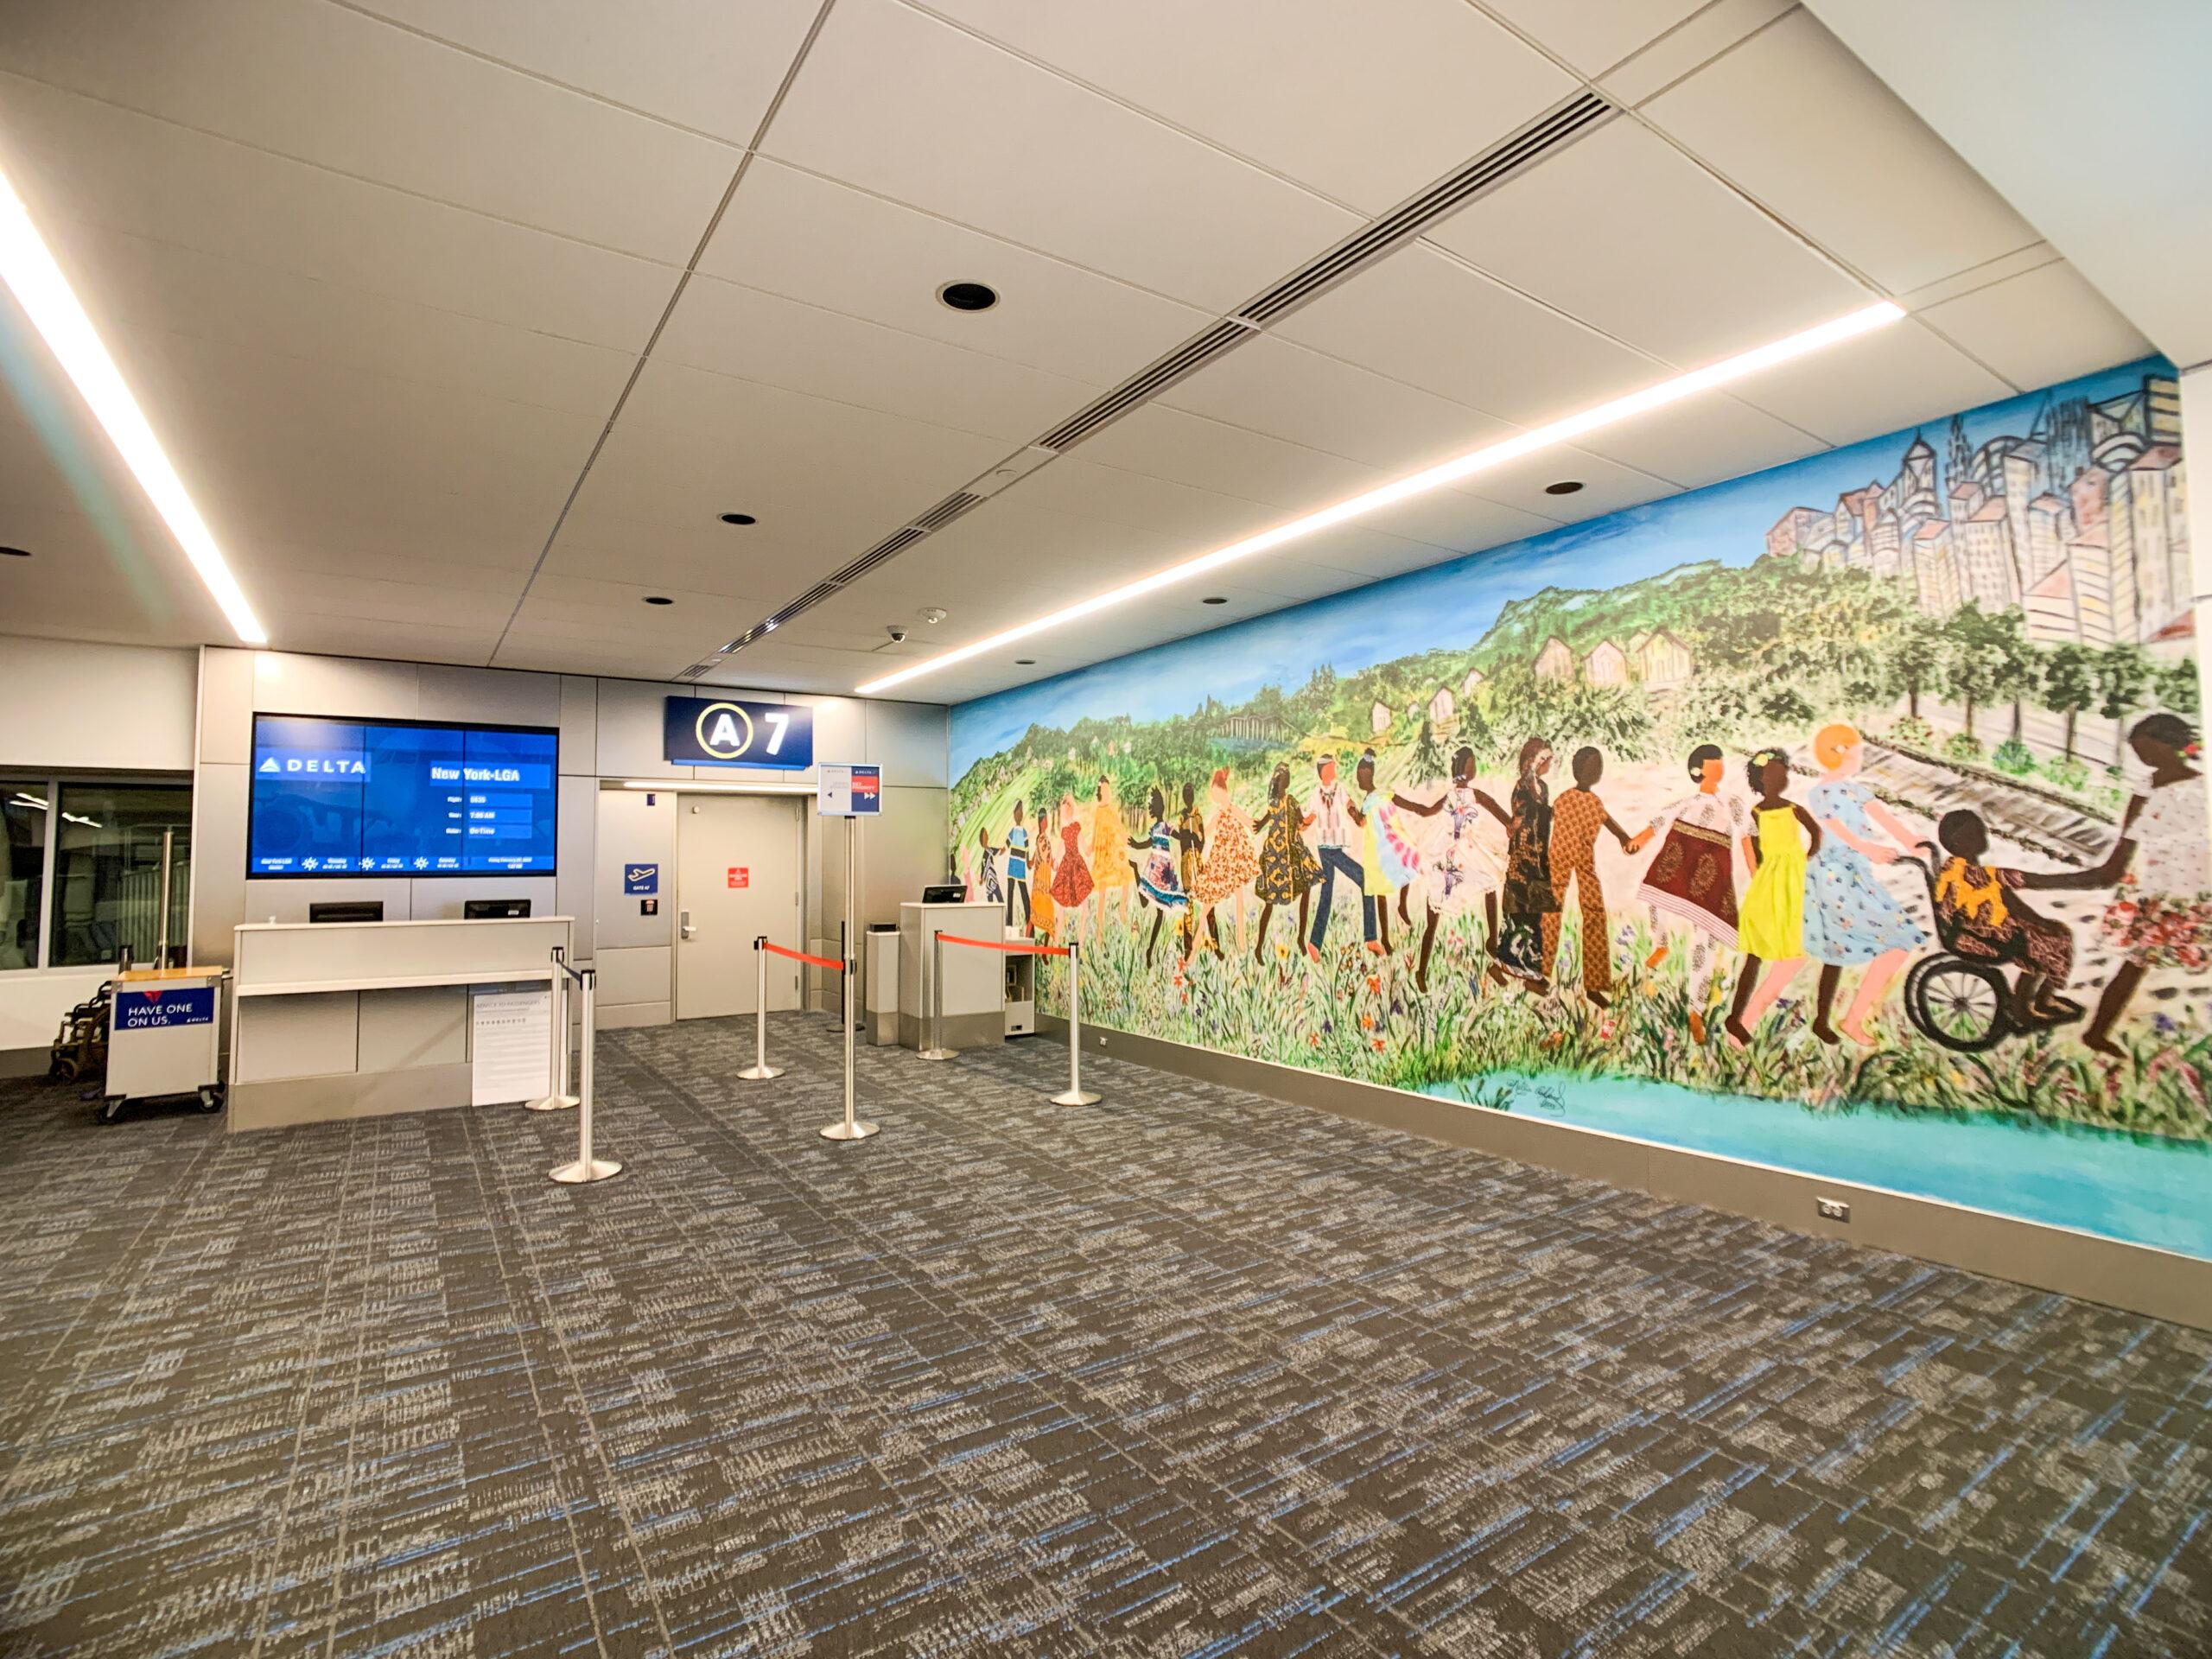 Charlotte Douglas Airport Gate